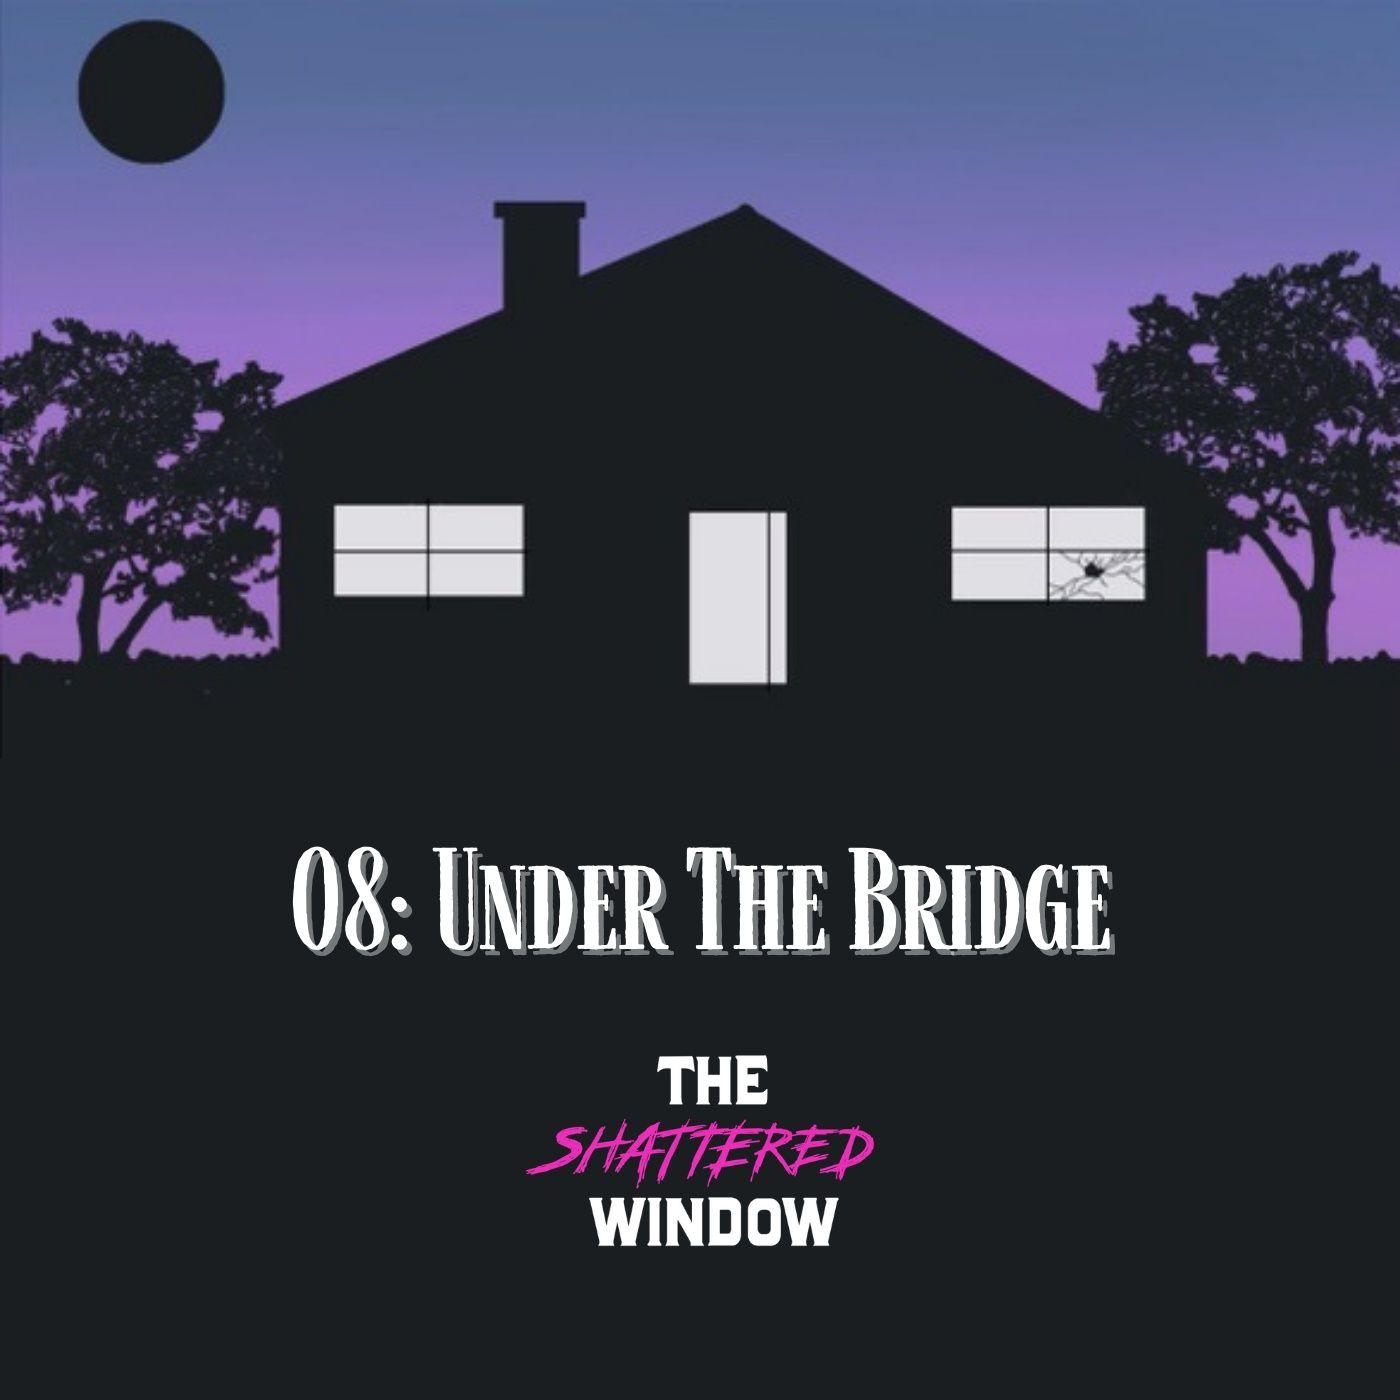 08: Under the Bridge